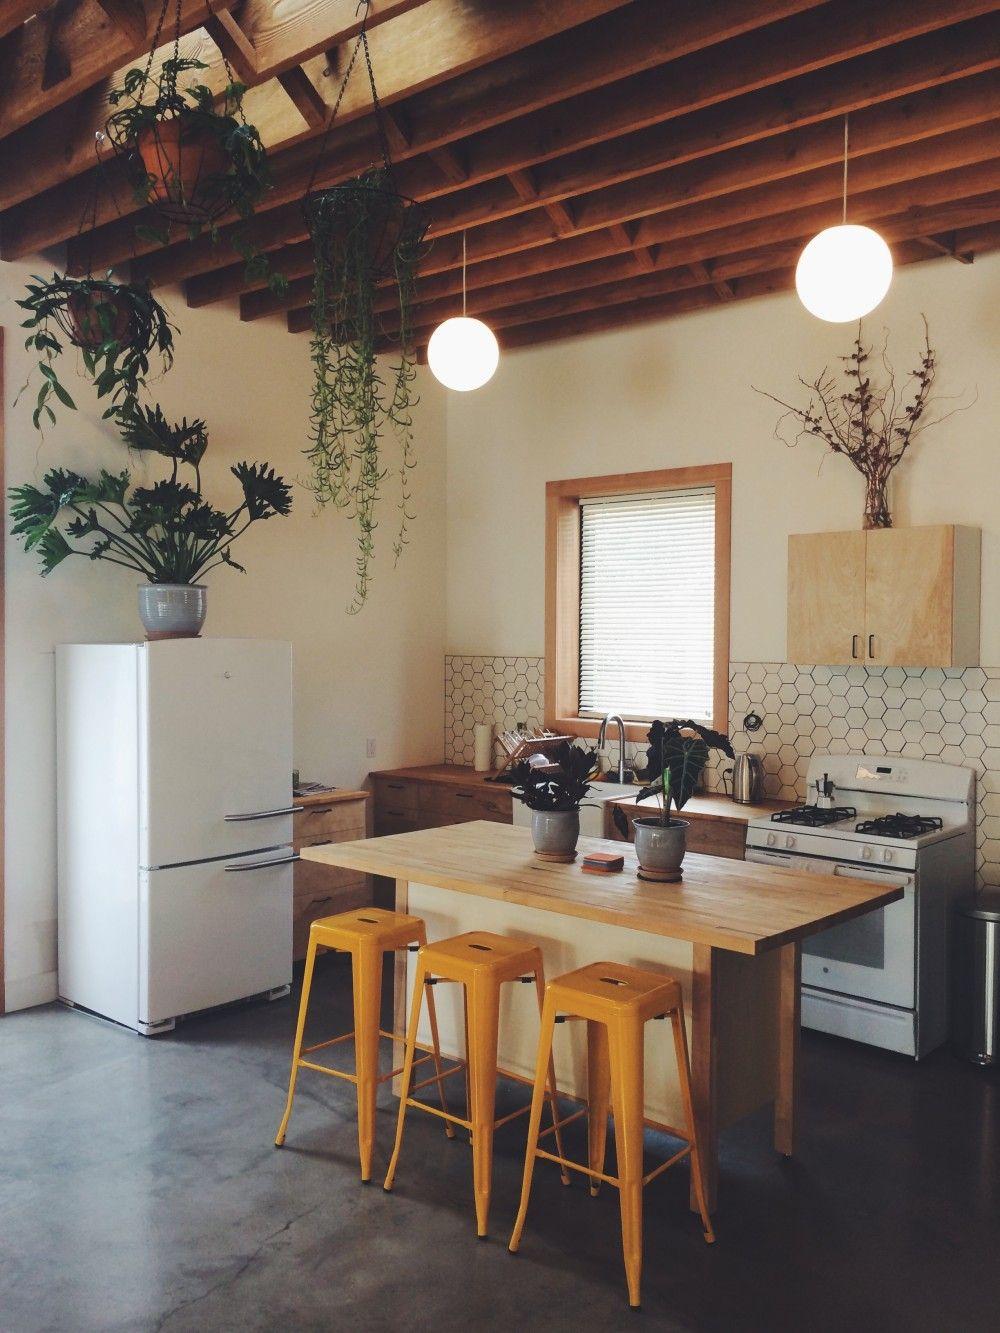 Pin by geordie gronn on kitchens pinterest office designs